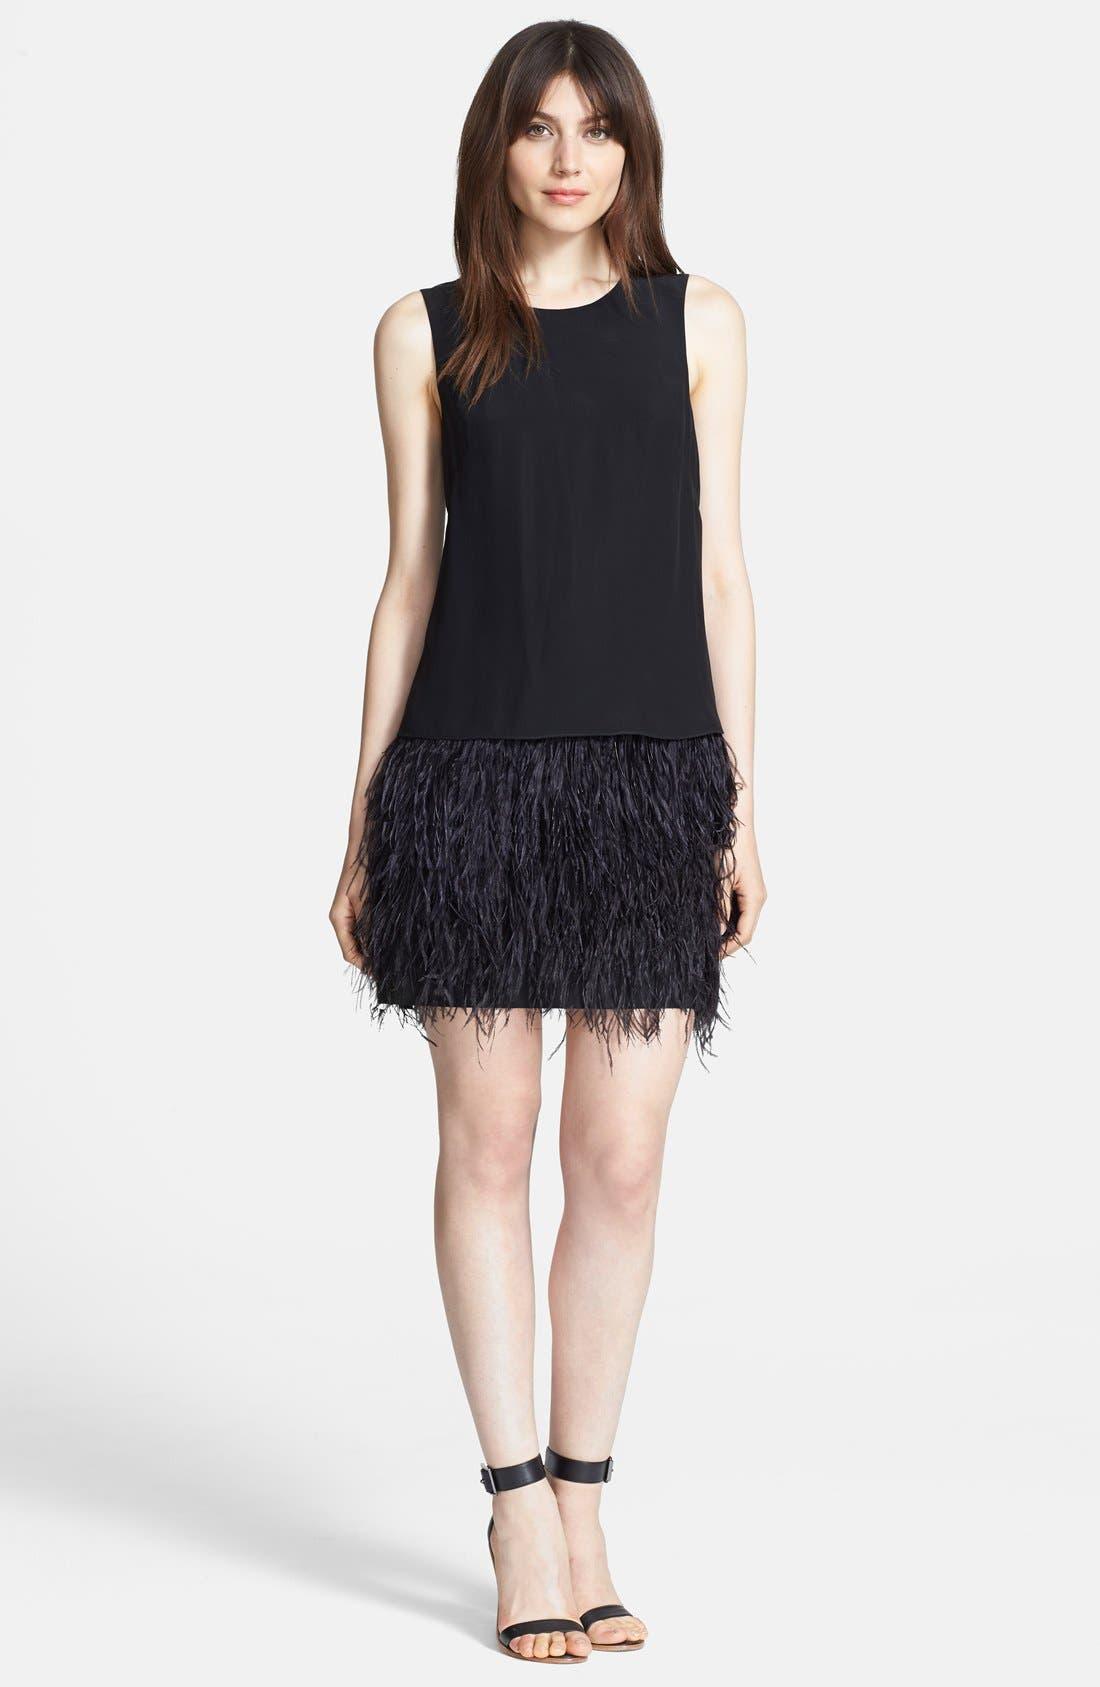 Main Image - Tibi 'Cera Tuxedo' Ostrich Feather Dress